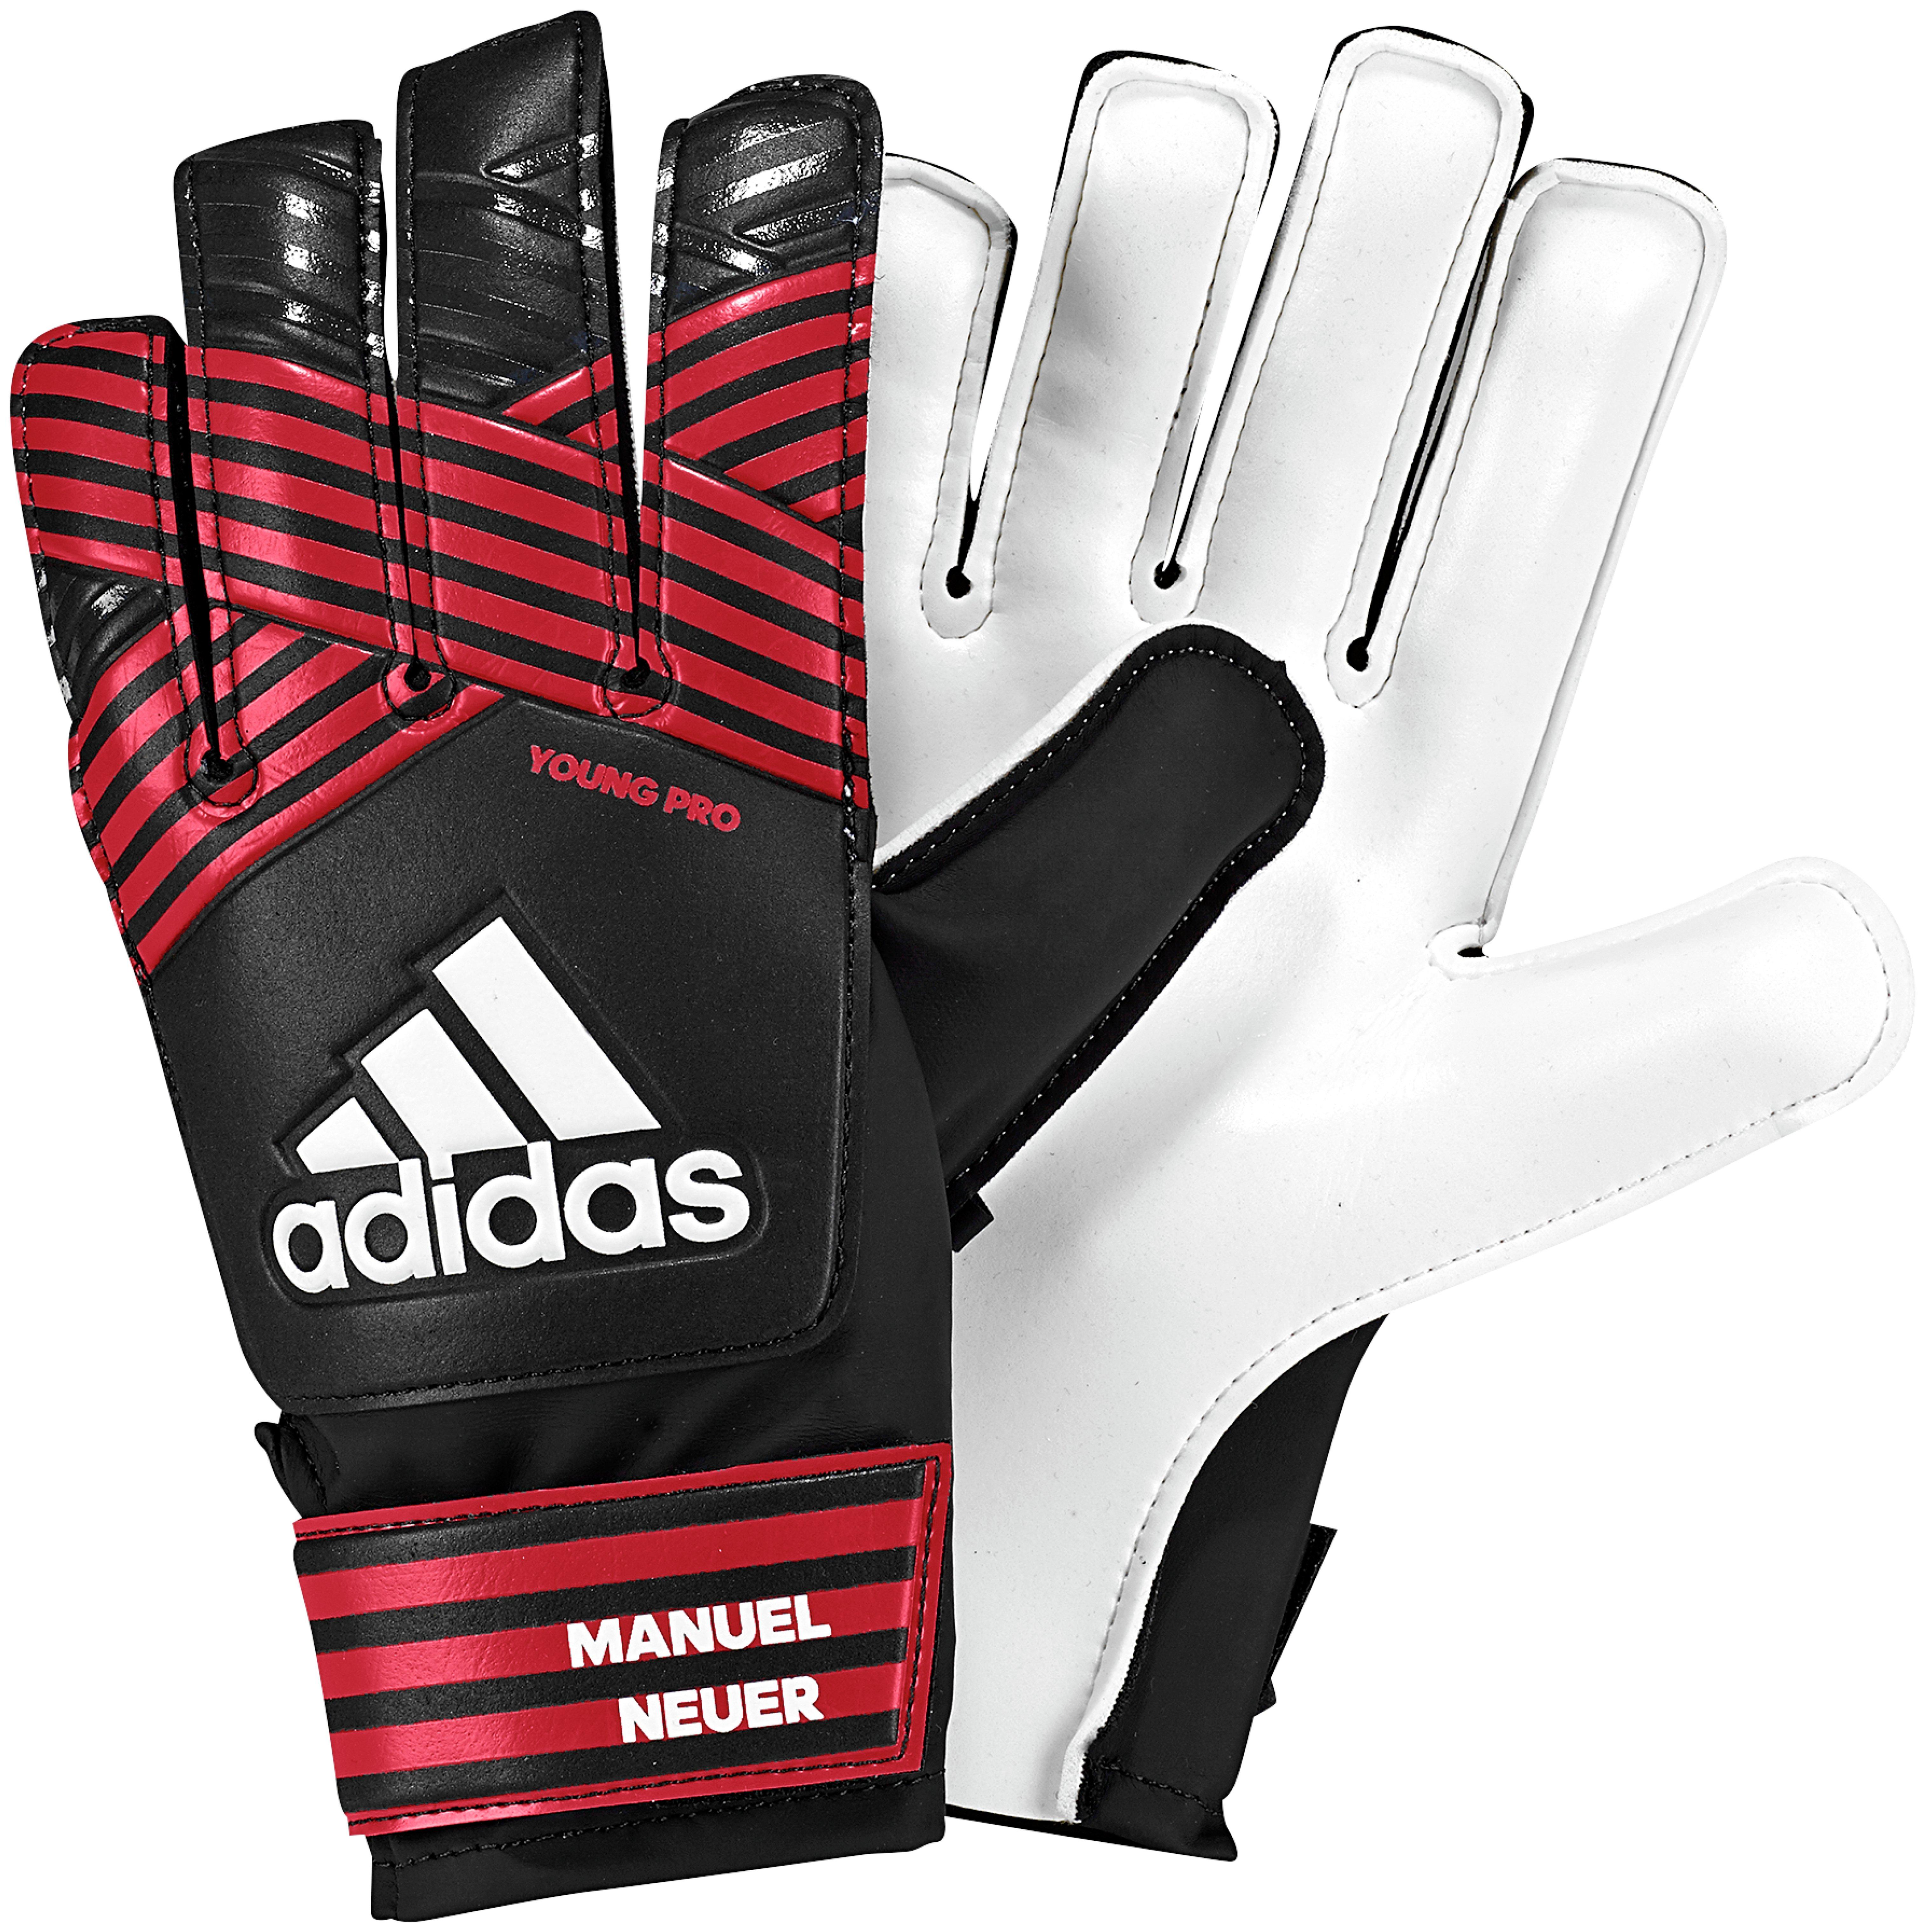 Nike Gloves Argos: Adidas Ace Football Gooalkeeper Gloves (7058945)